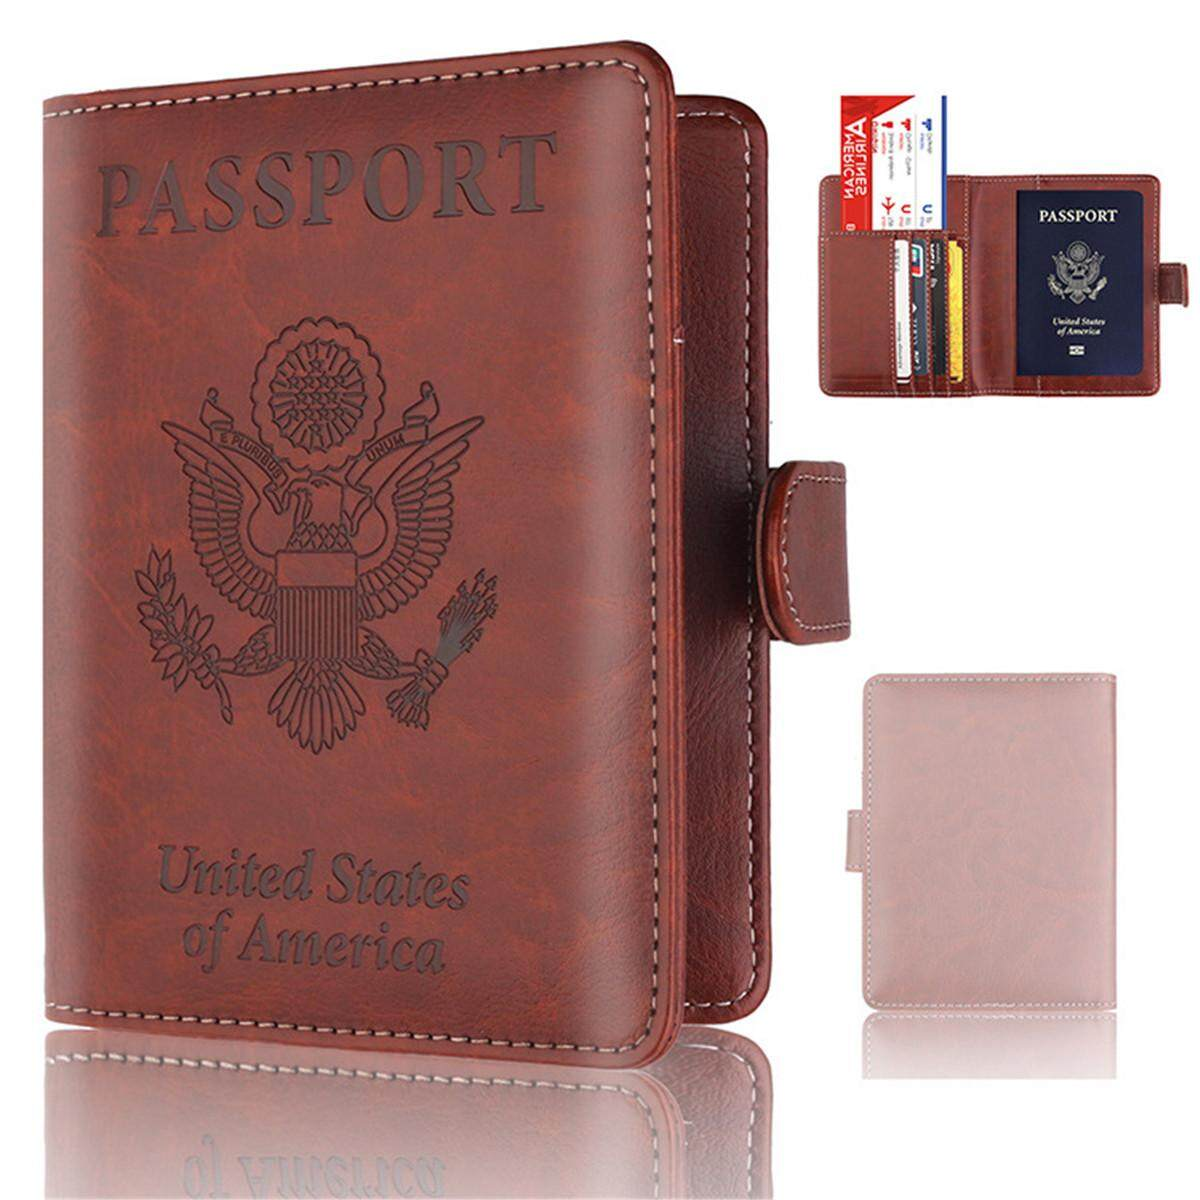 a3ef9a97dcd Passport Holder Wallet Cover Case RFID Blocking Travel Wallet Rose Gold   brown